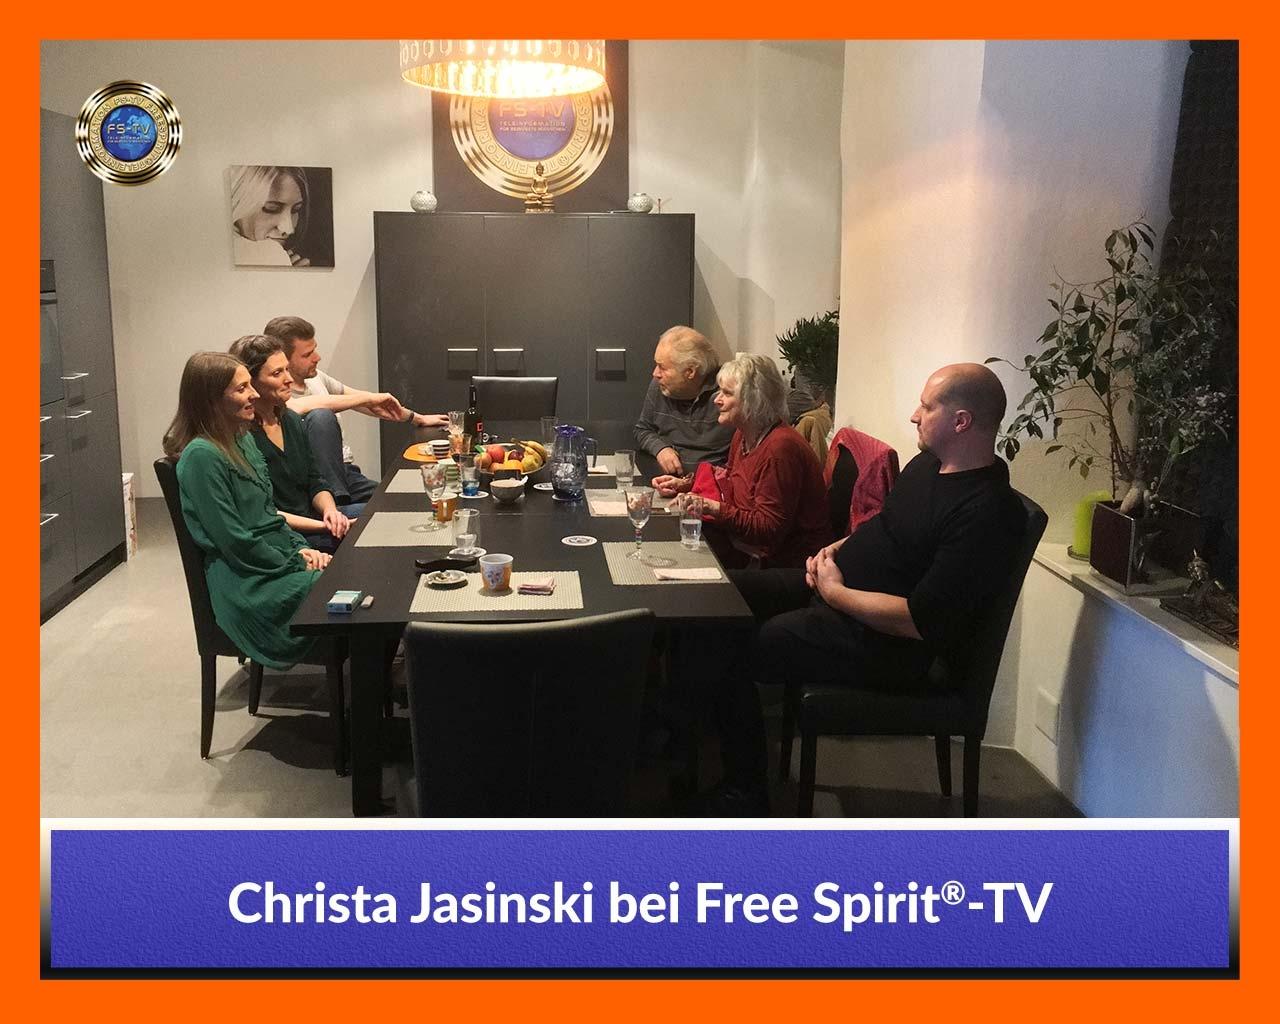 Galleriebild-Christa-Jasinski-10